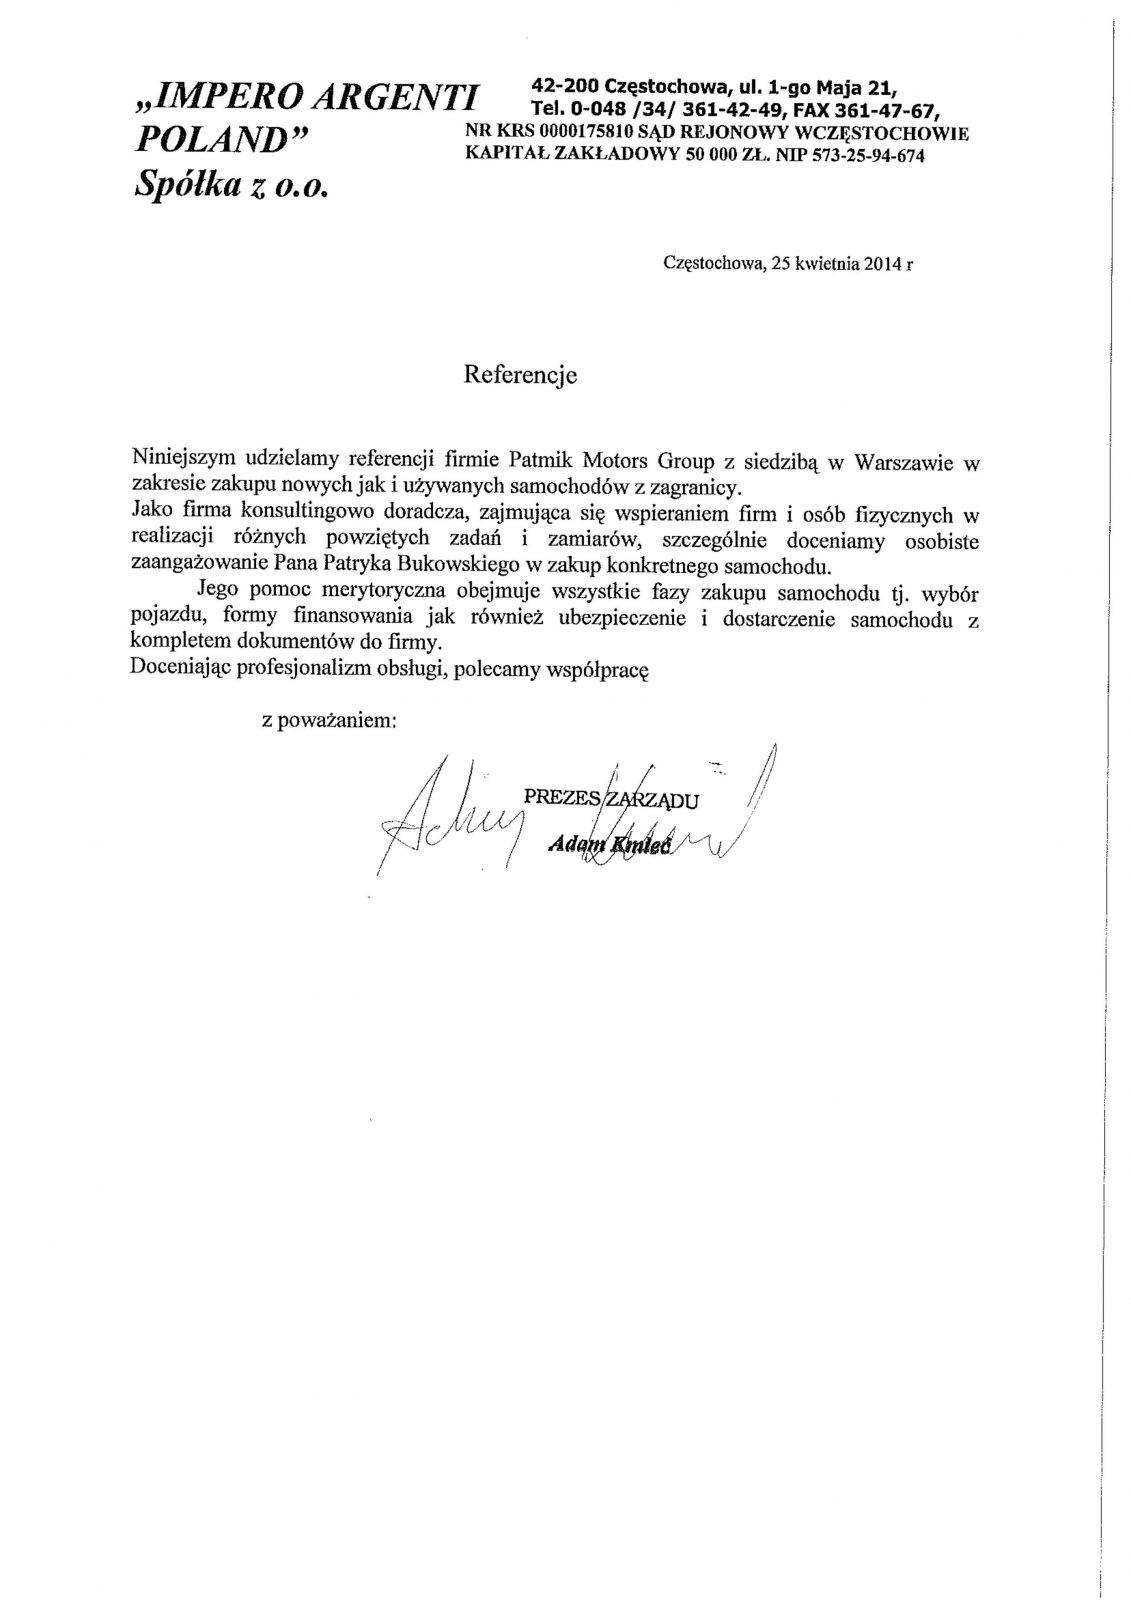 Imperio Argenti Poland Sp. z o.o.